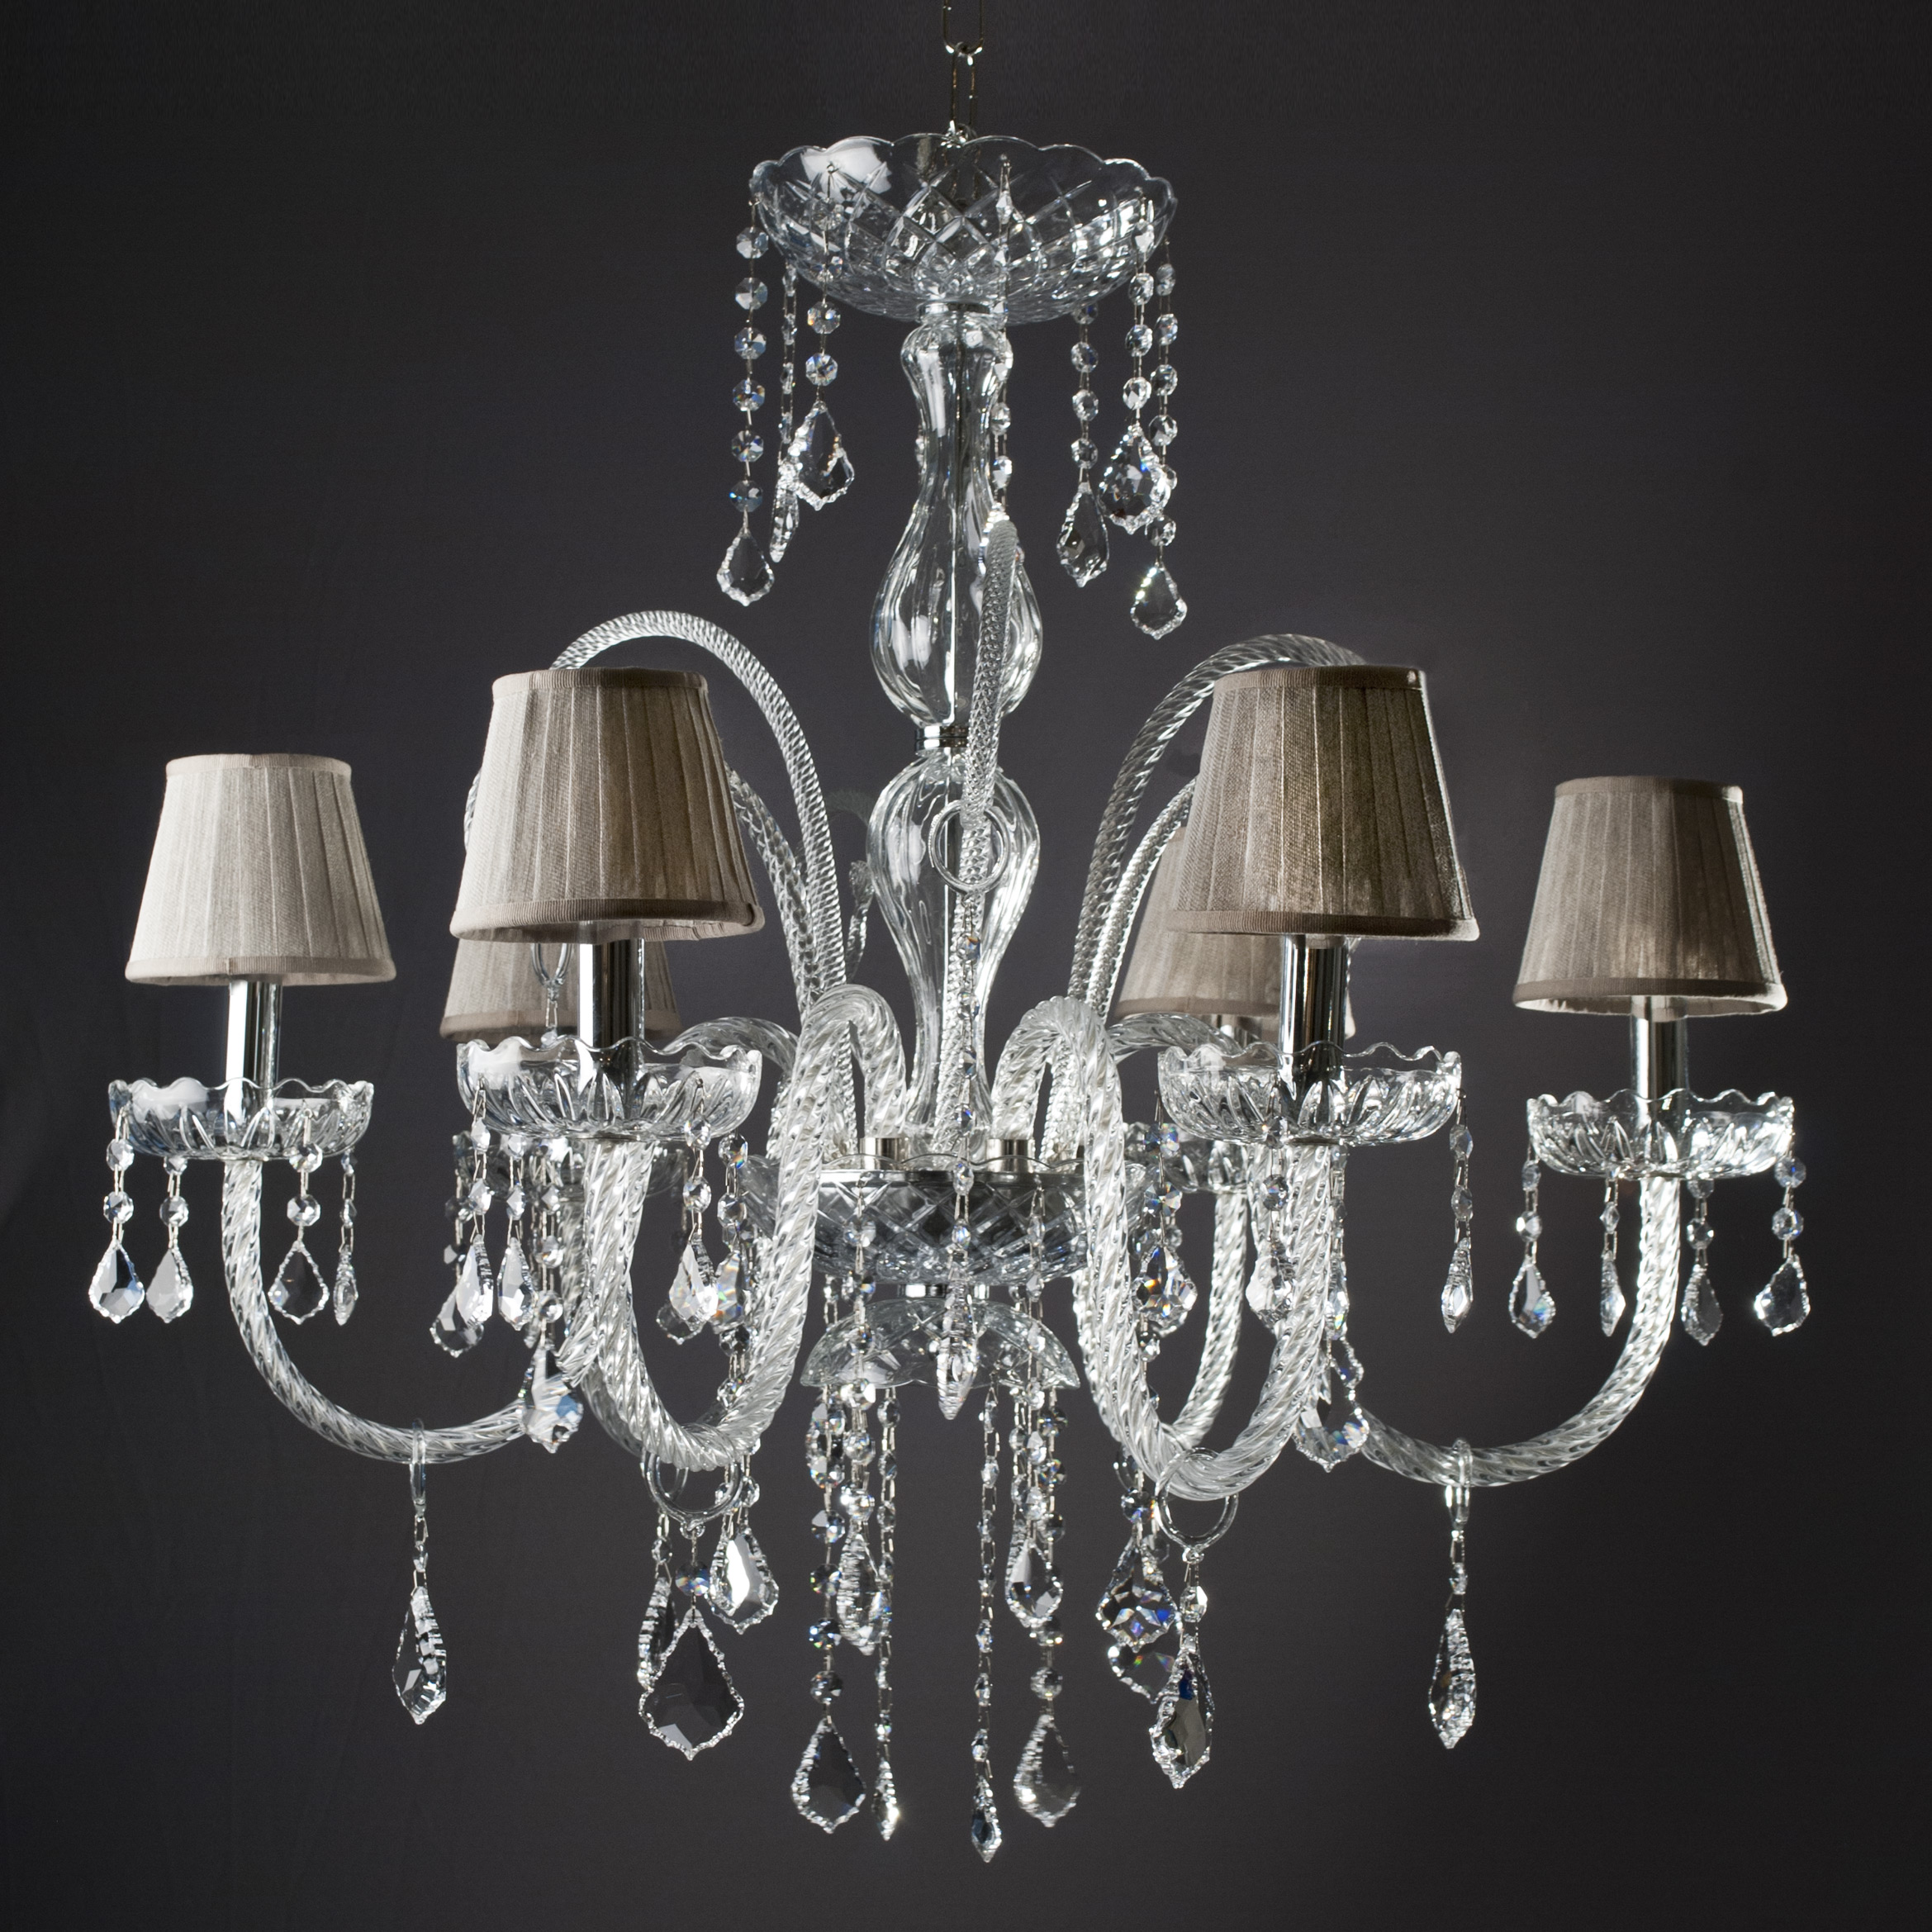 Villaverde london swan crystal chandelier shades square villaverde villaverde london swan crystal chandelier shades square aloadofball Images